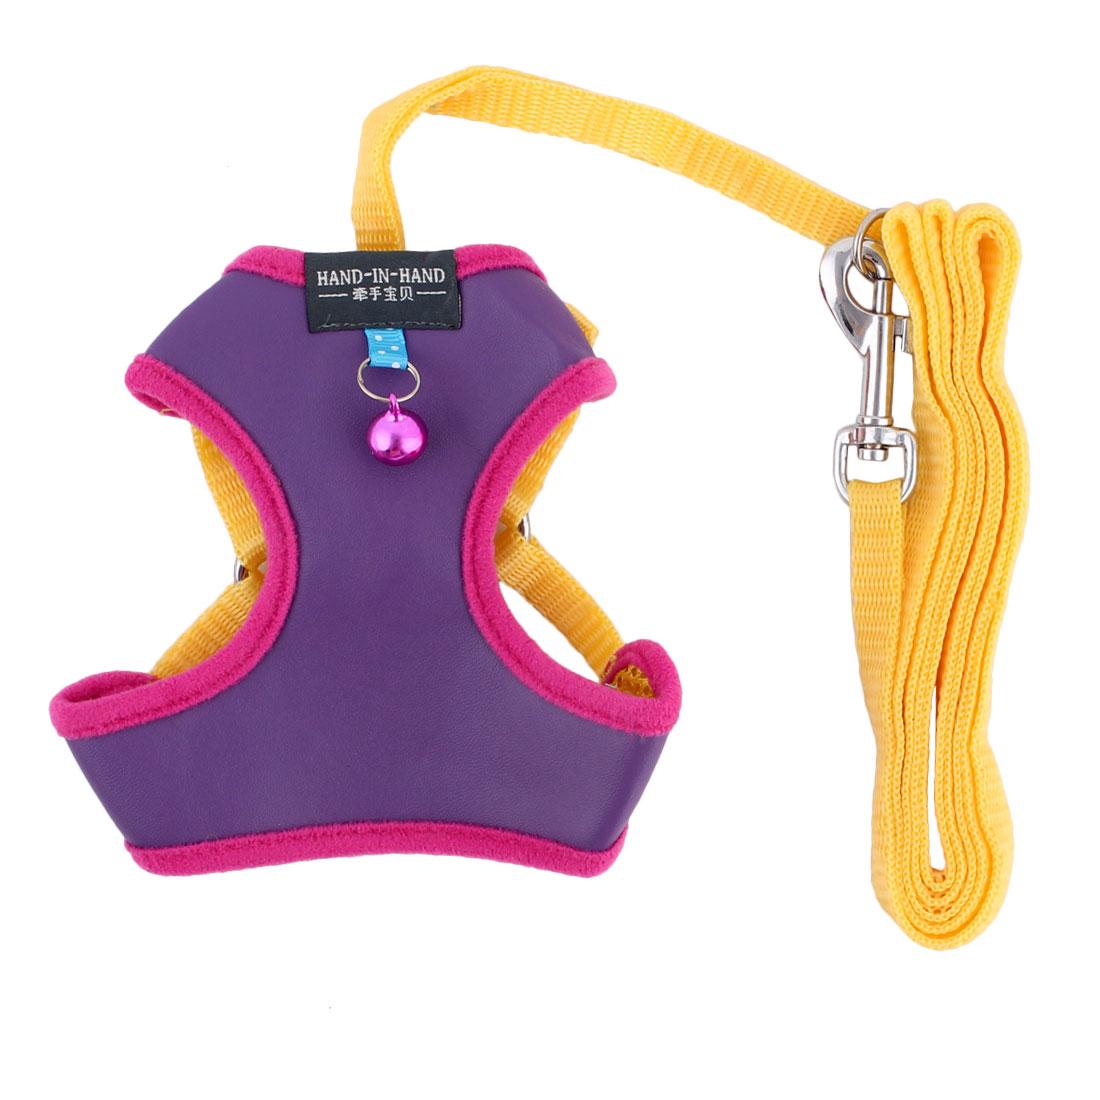 Dog Walking Supplies Faux Leather Breathable Harness Vest Leash Purple Size S